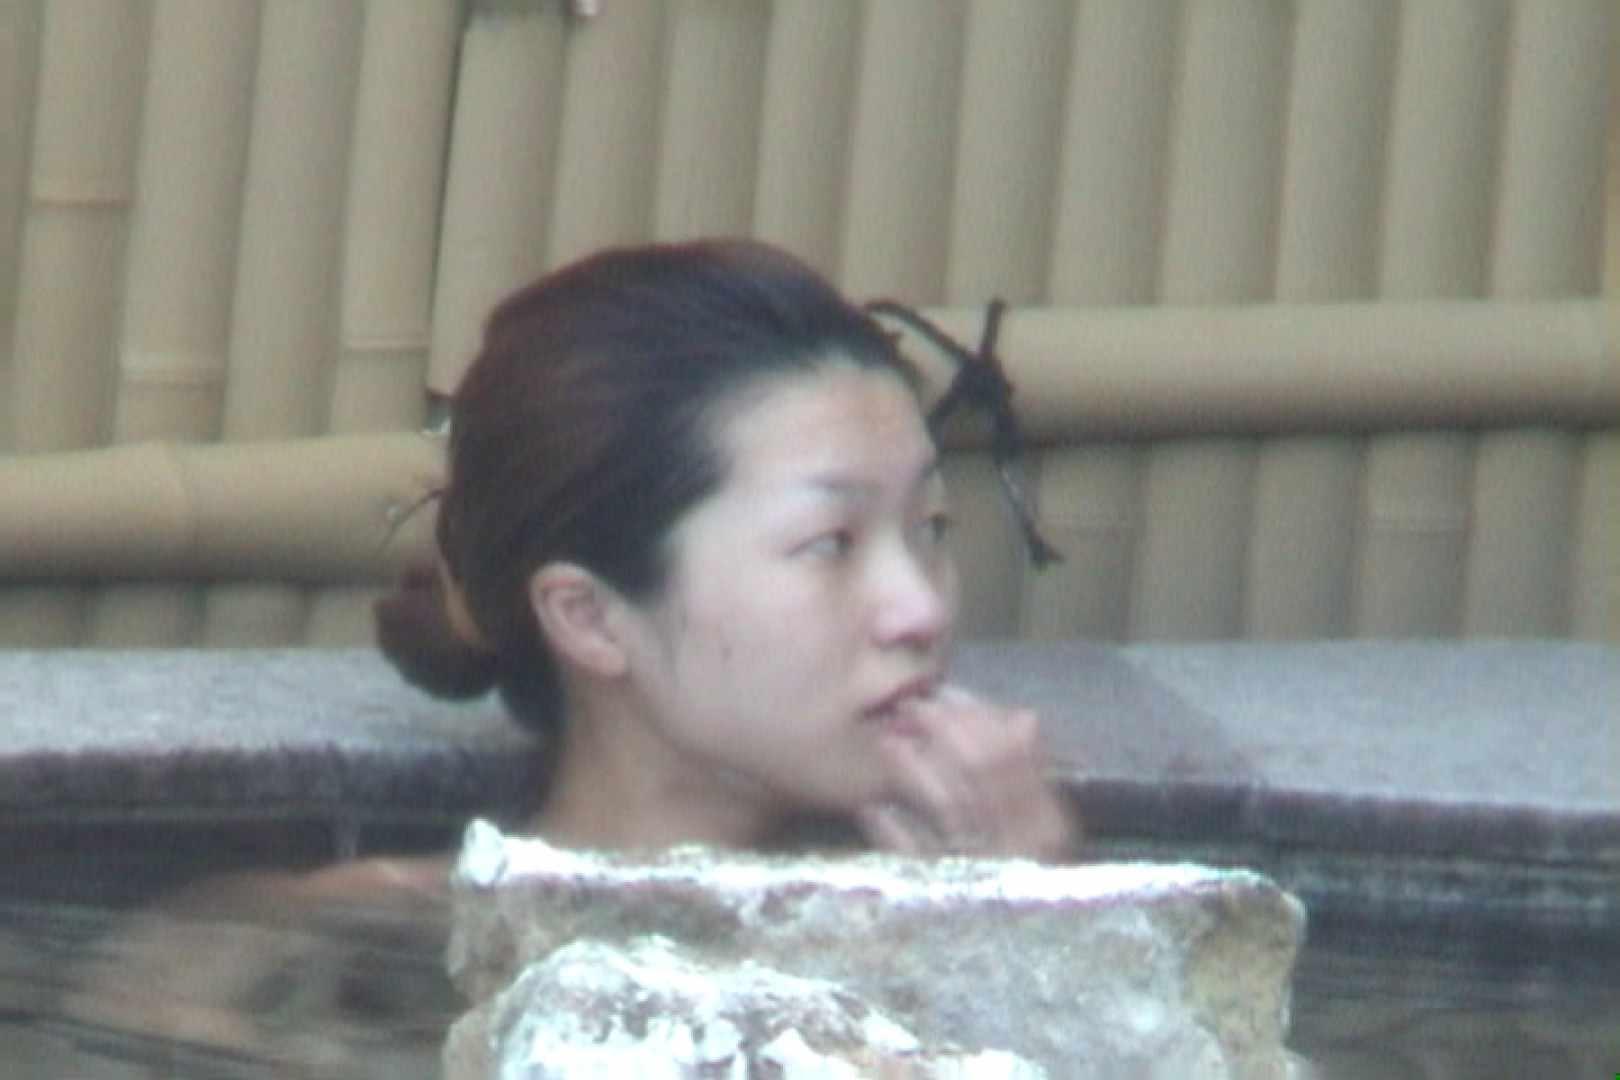 Aquaな露天風呂Vol.571 盗撮 | OLセックス  83画像 28